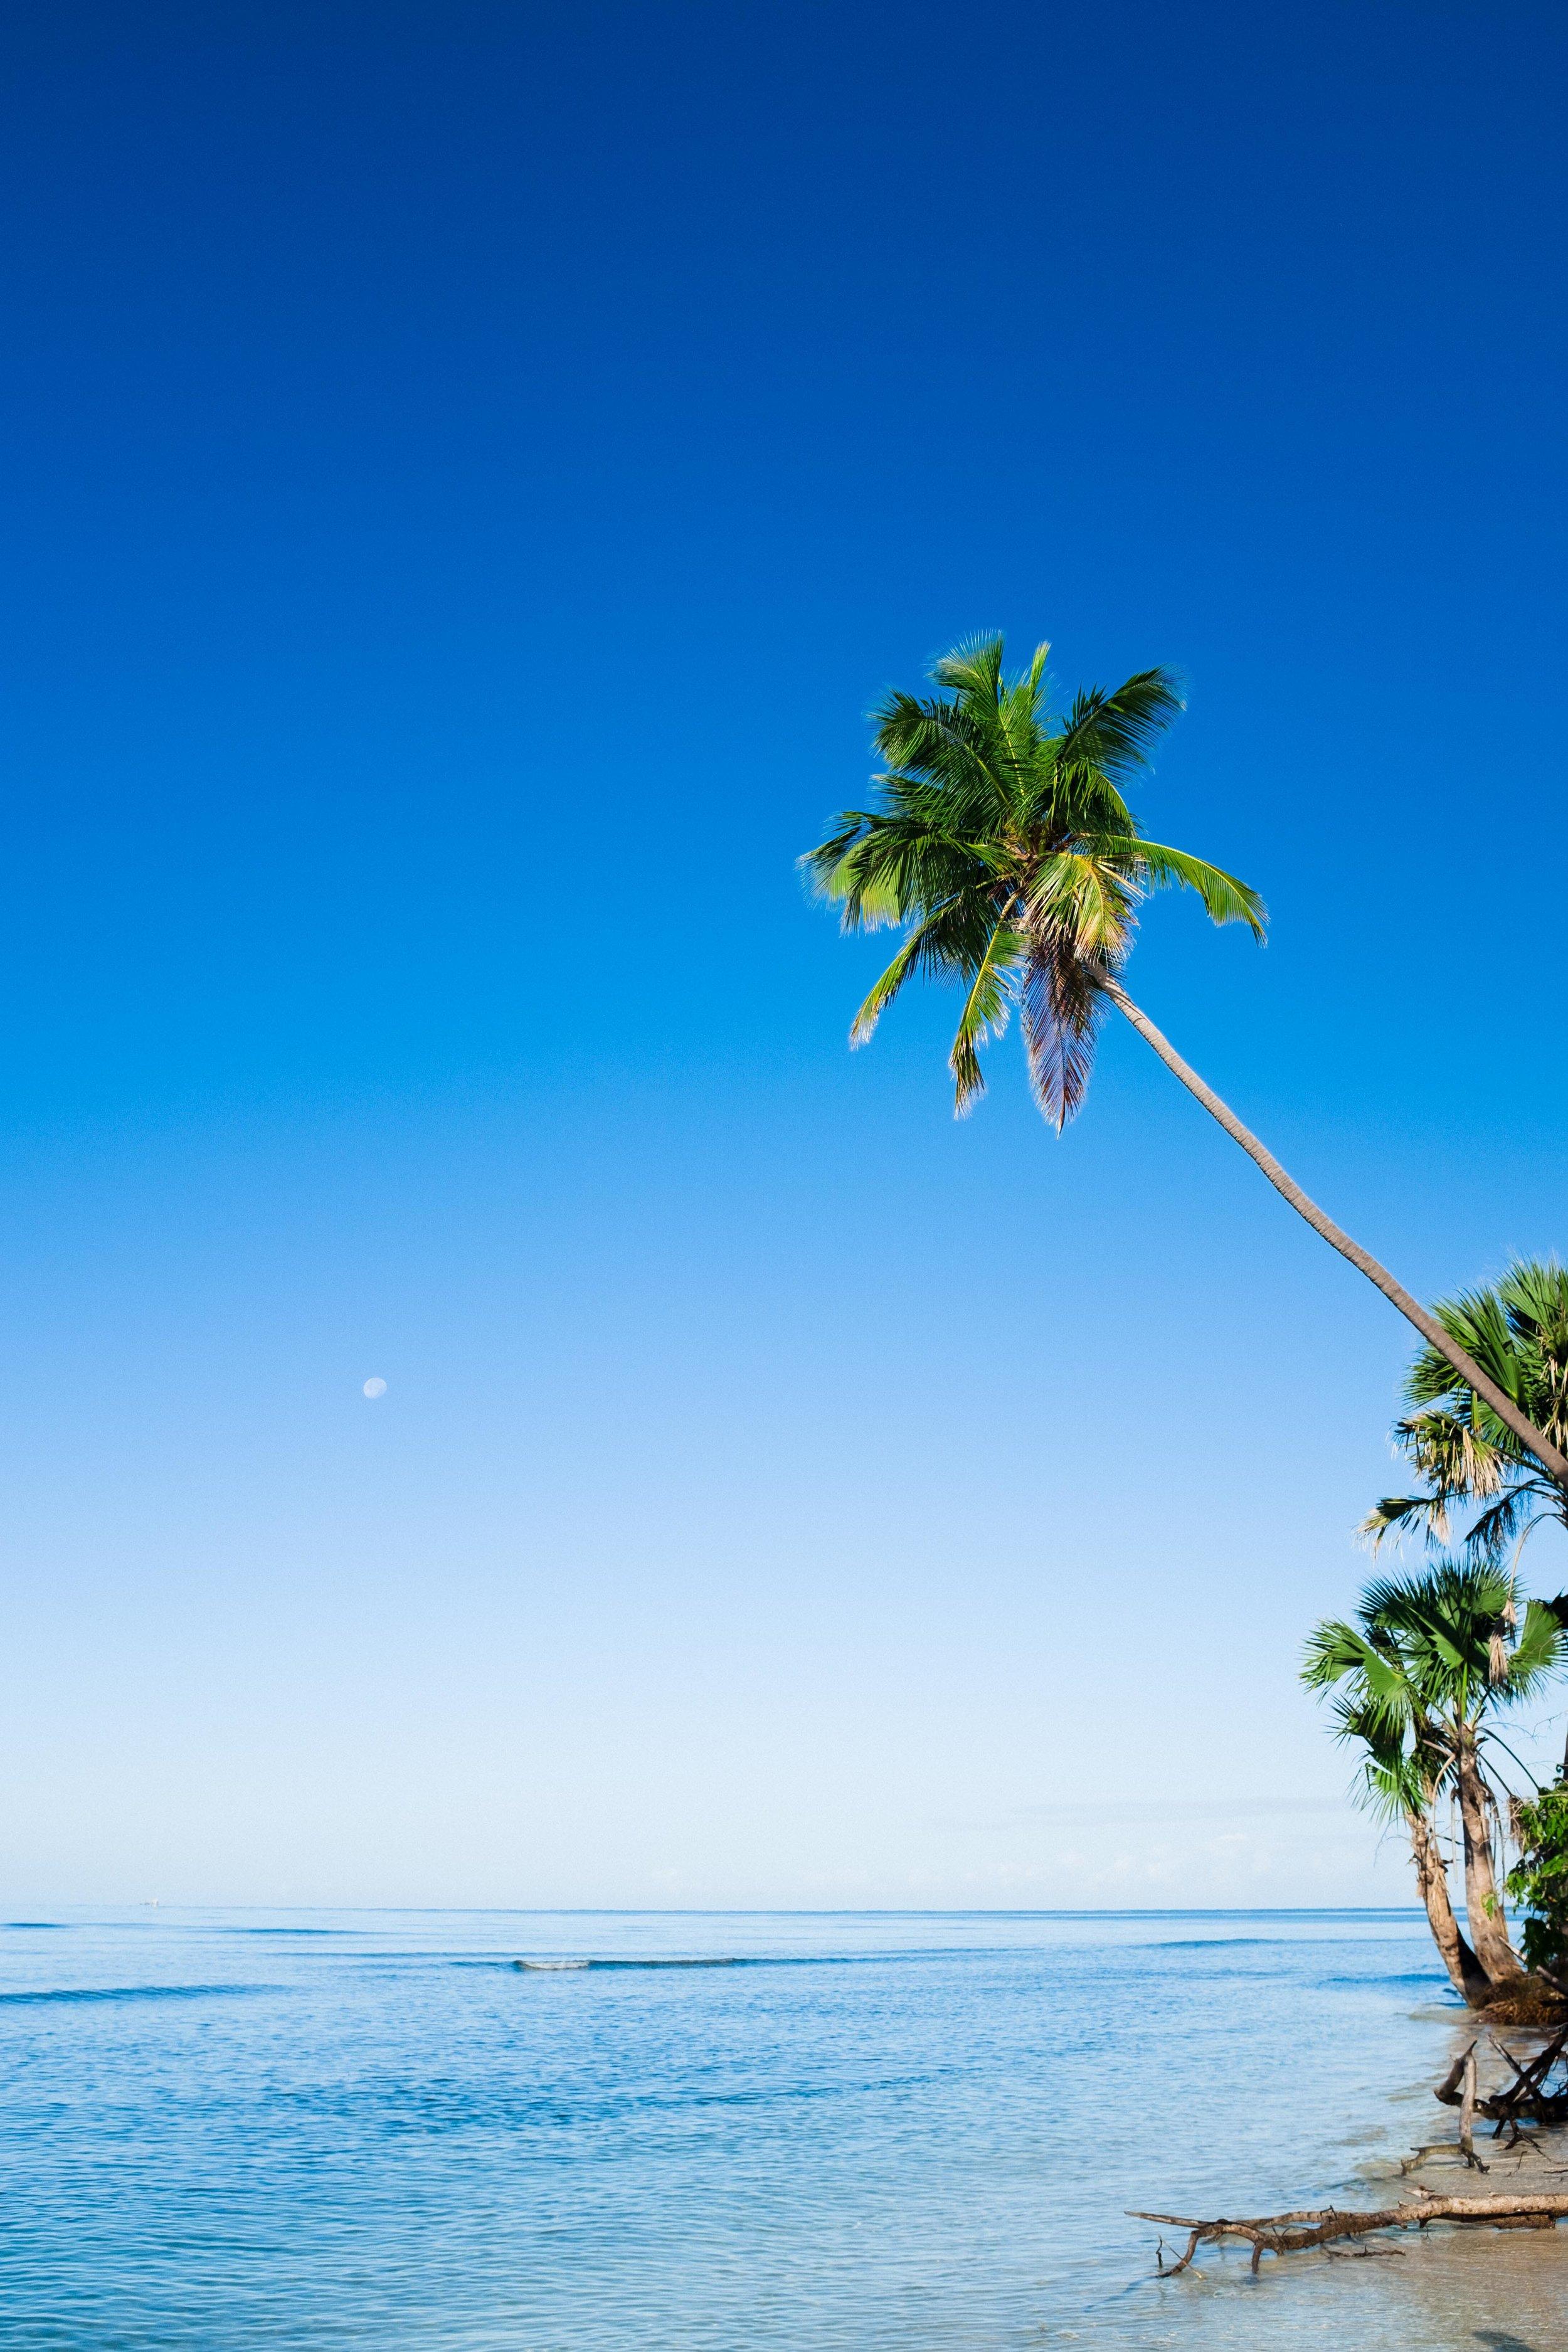 puerto-rico-cabo-rojo-playa-buye-beach-6694.jpg